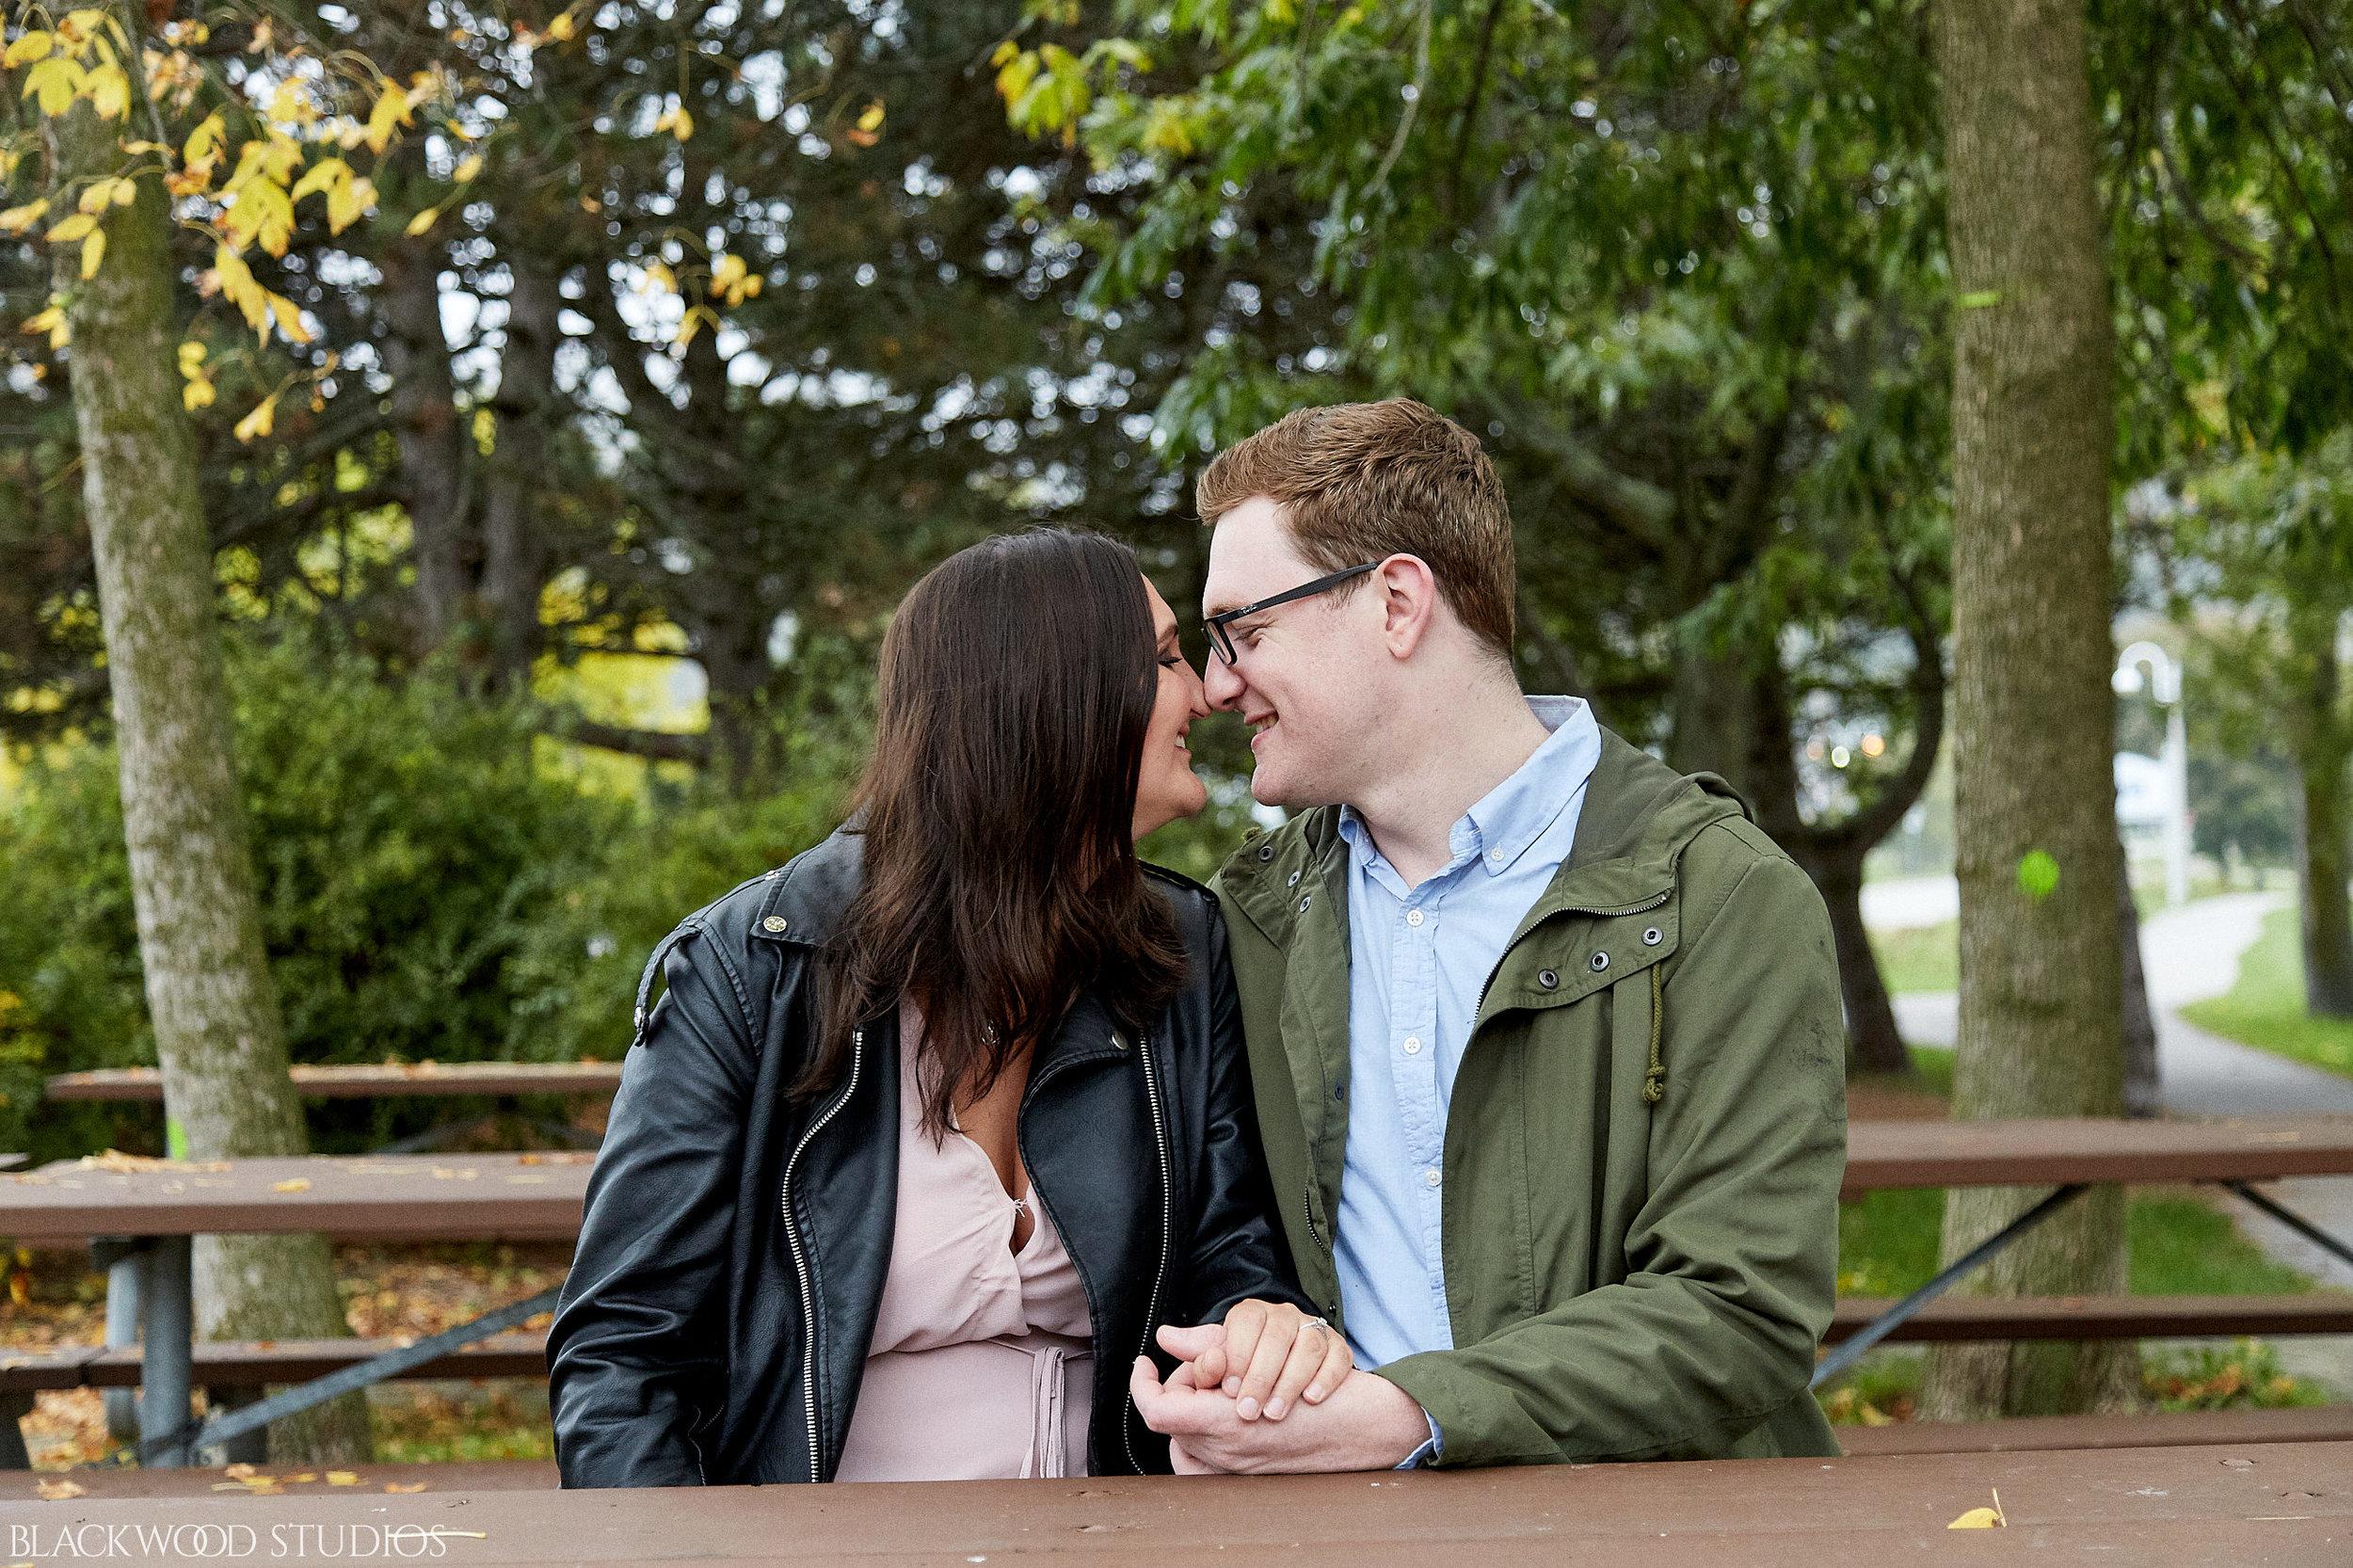 Blackwood-Studios-20181008-18-21-13-Justin-and-Samantha-Engagement-Photography-foggy-Scaraborough-Bluffs-Park-Ontario.jpg